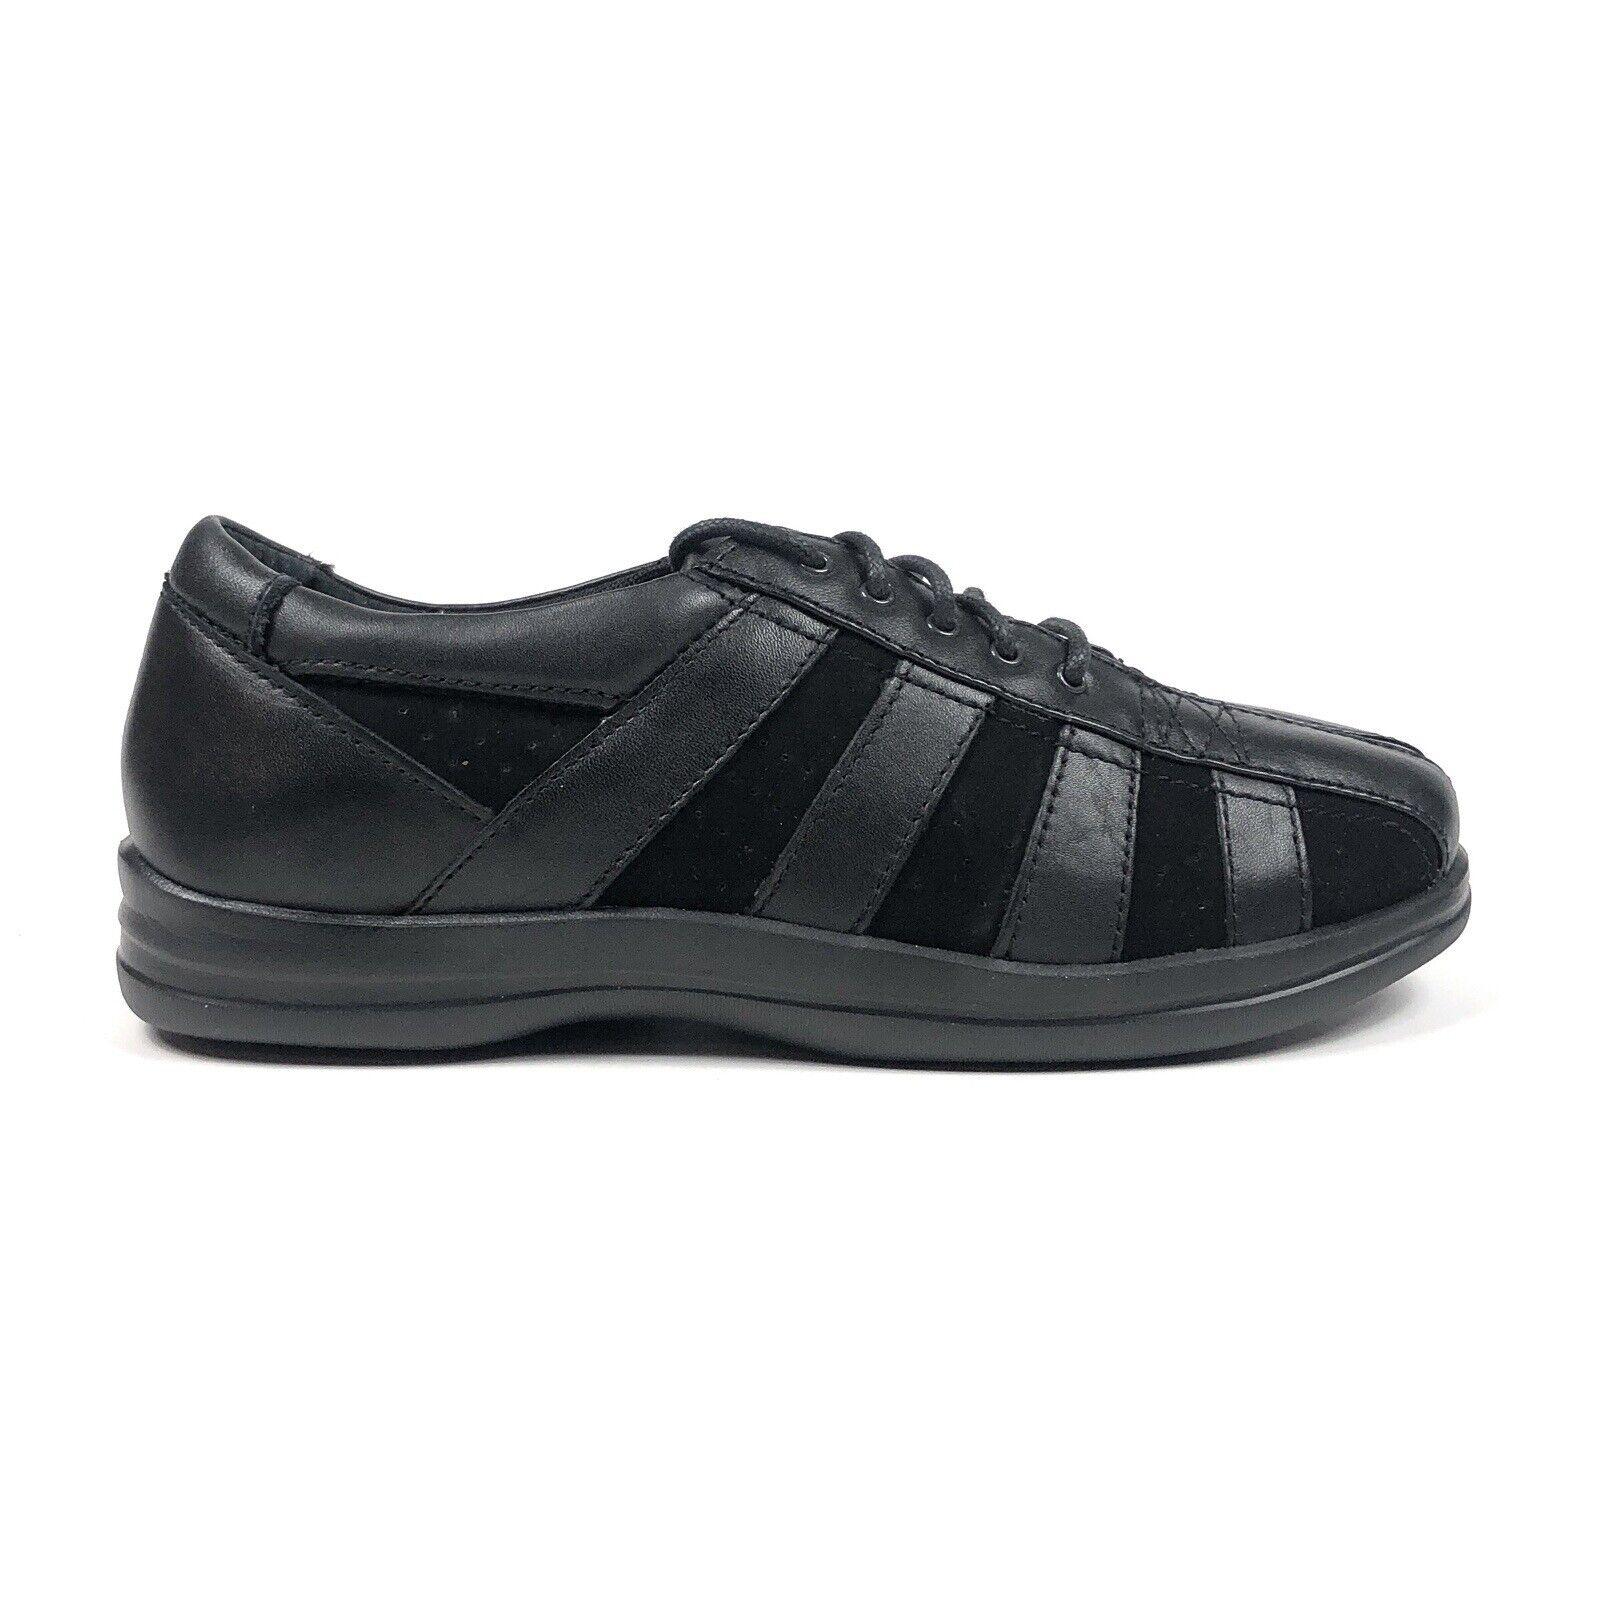 Apex Petals Eliza Womens 8 Wide Black Leather Non Slip Comfort Shoes Sneakers